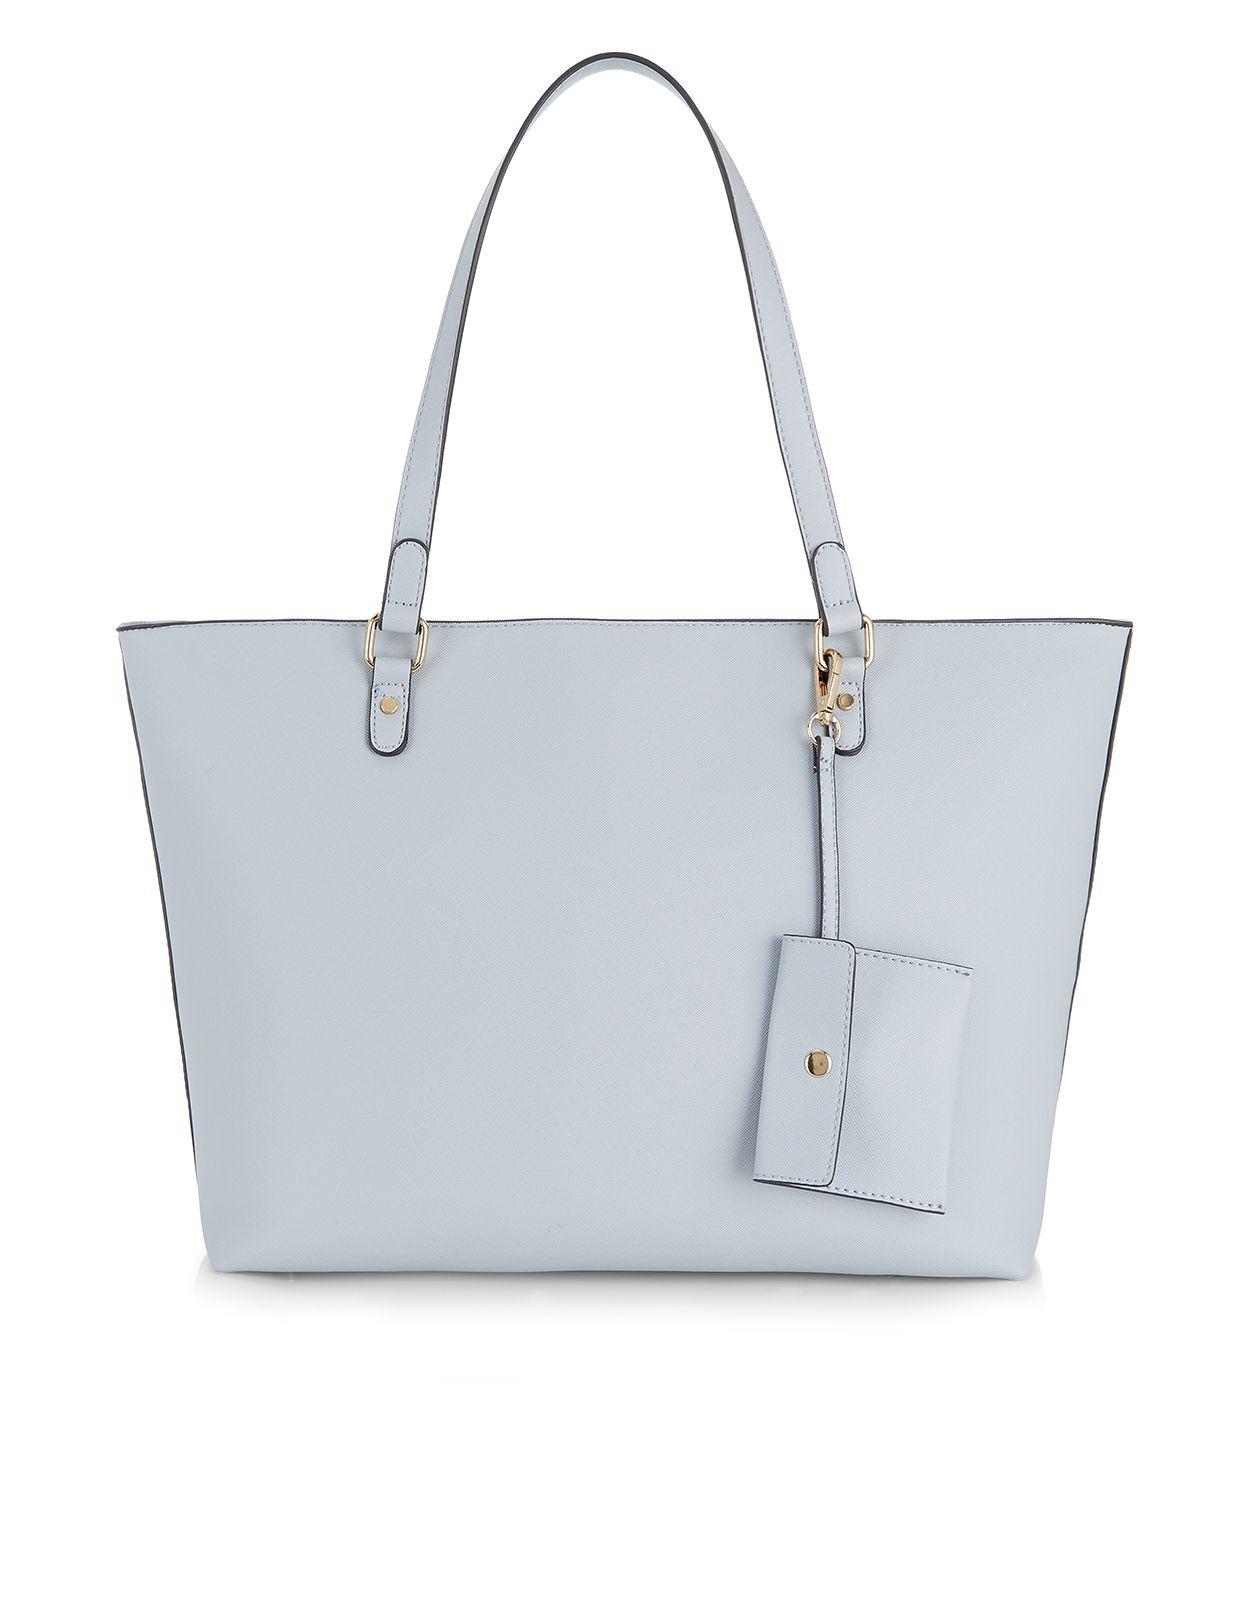 8805e0182e1e Isabella Winged Tote Bag